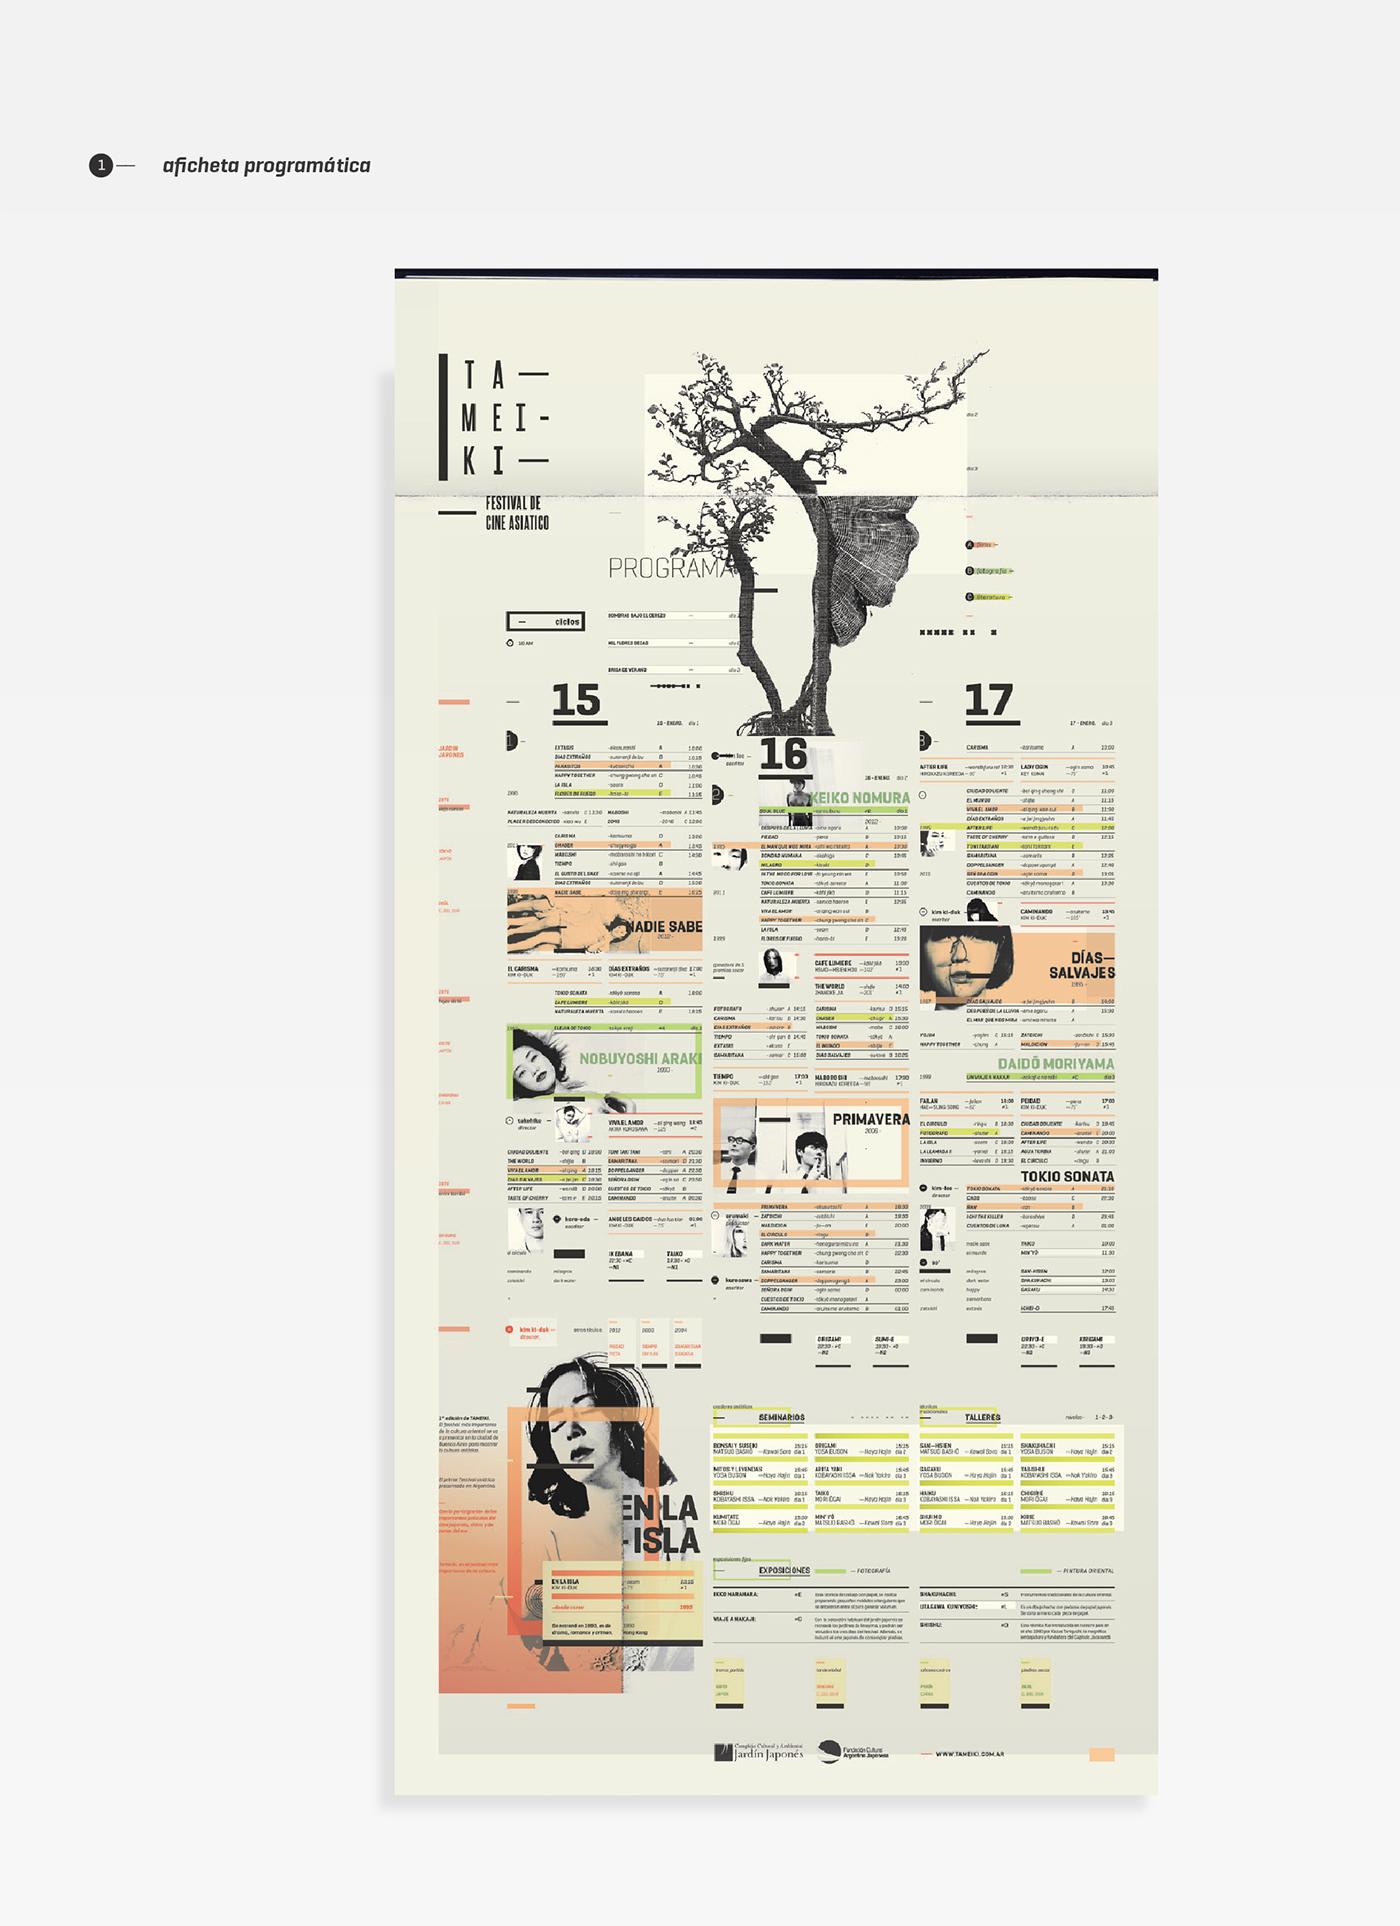 festival cine asiatico asian movie Gabriele fadu identidad sistema afiche triptico brand logo marca identity